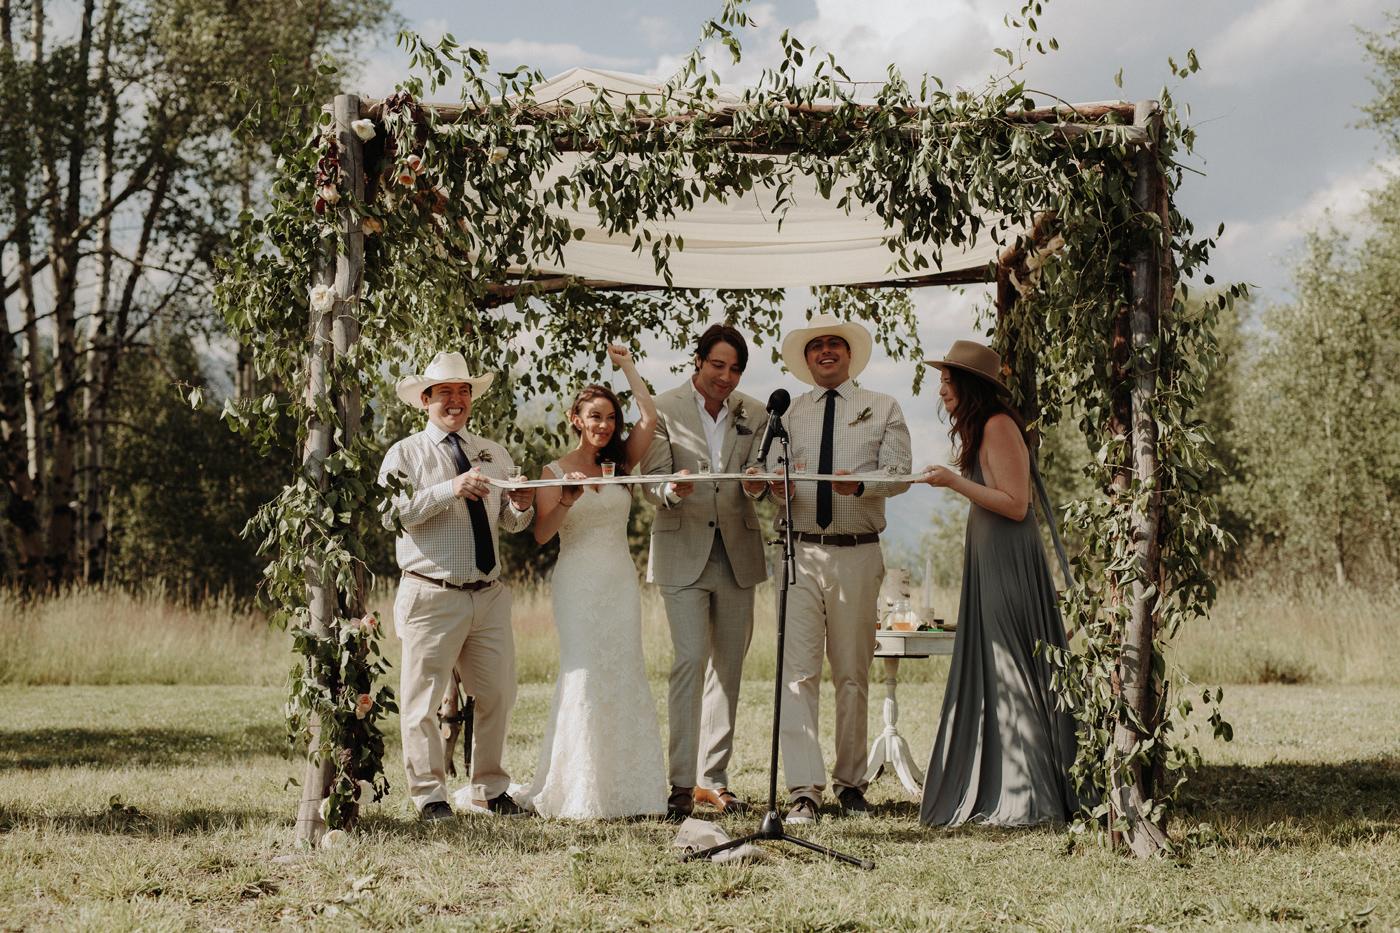 036-grand-teton-jackson-hole-wyoming-wedding.jpg